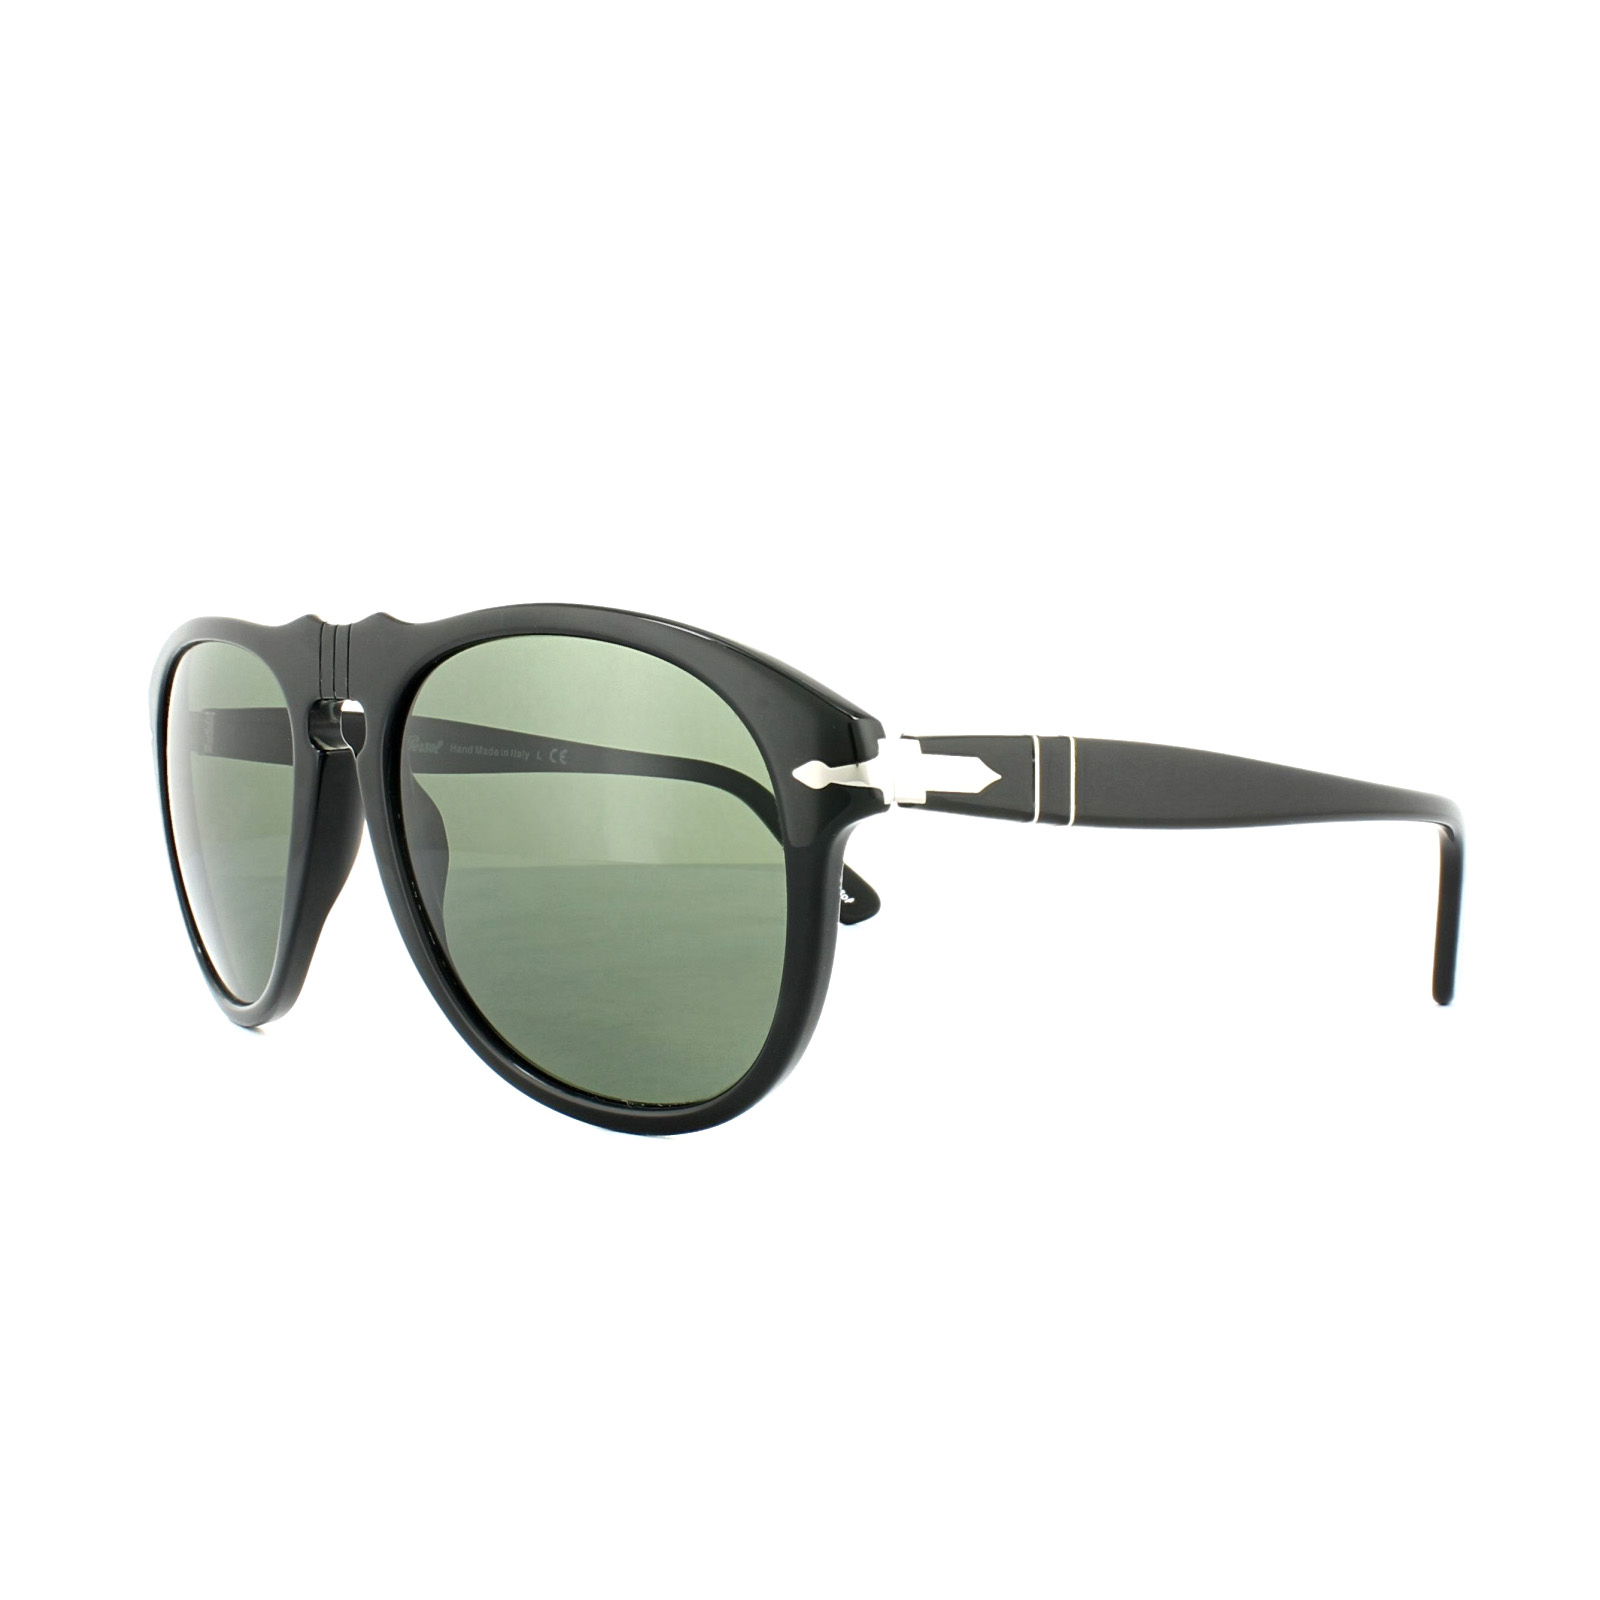 3919765dff Persol Sunglasses 0649 95 31 Black Green 56mm 713132003558